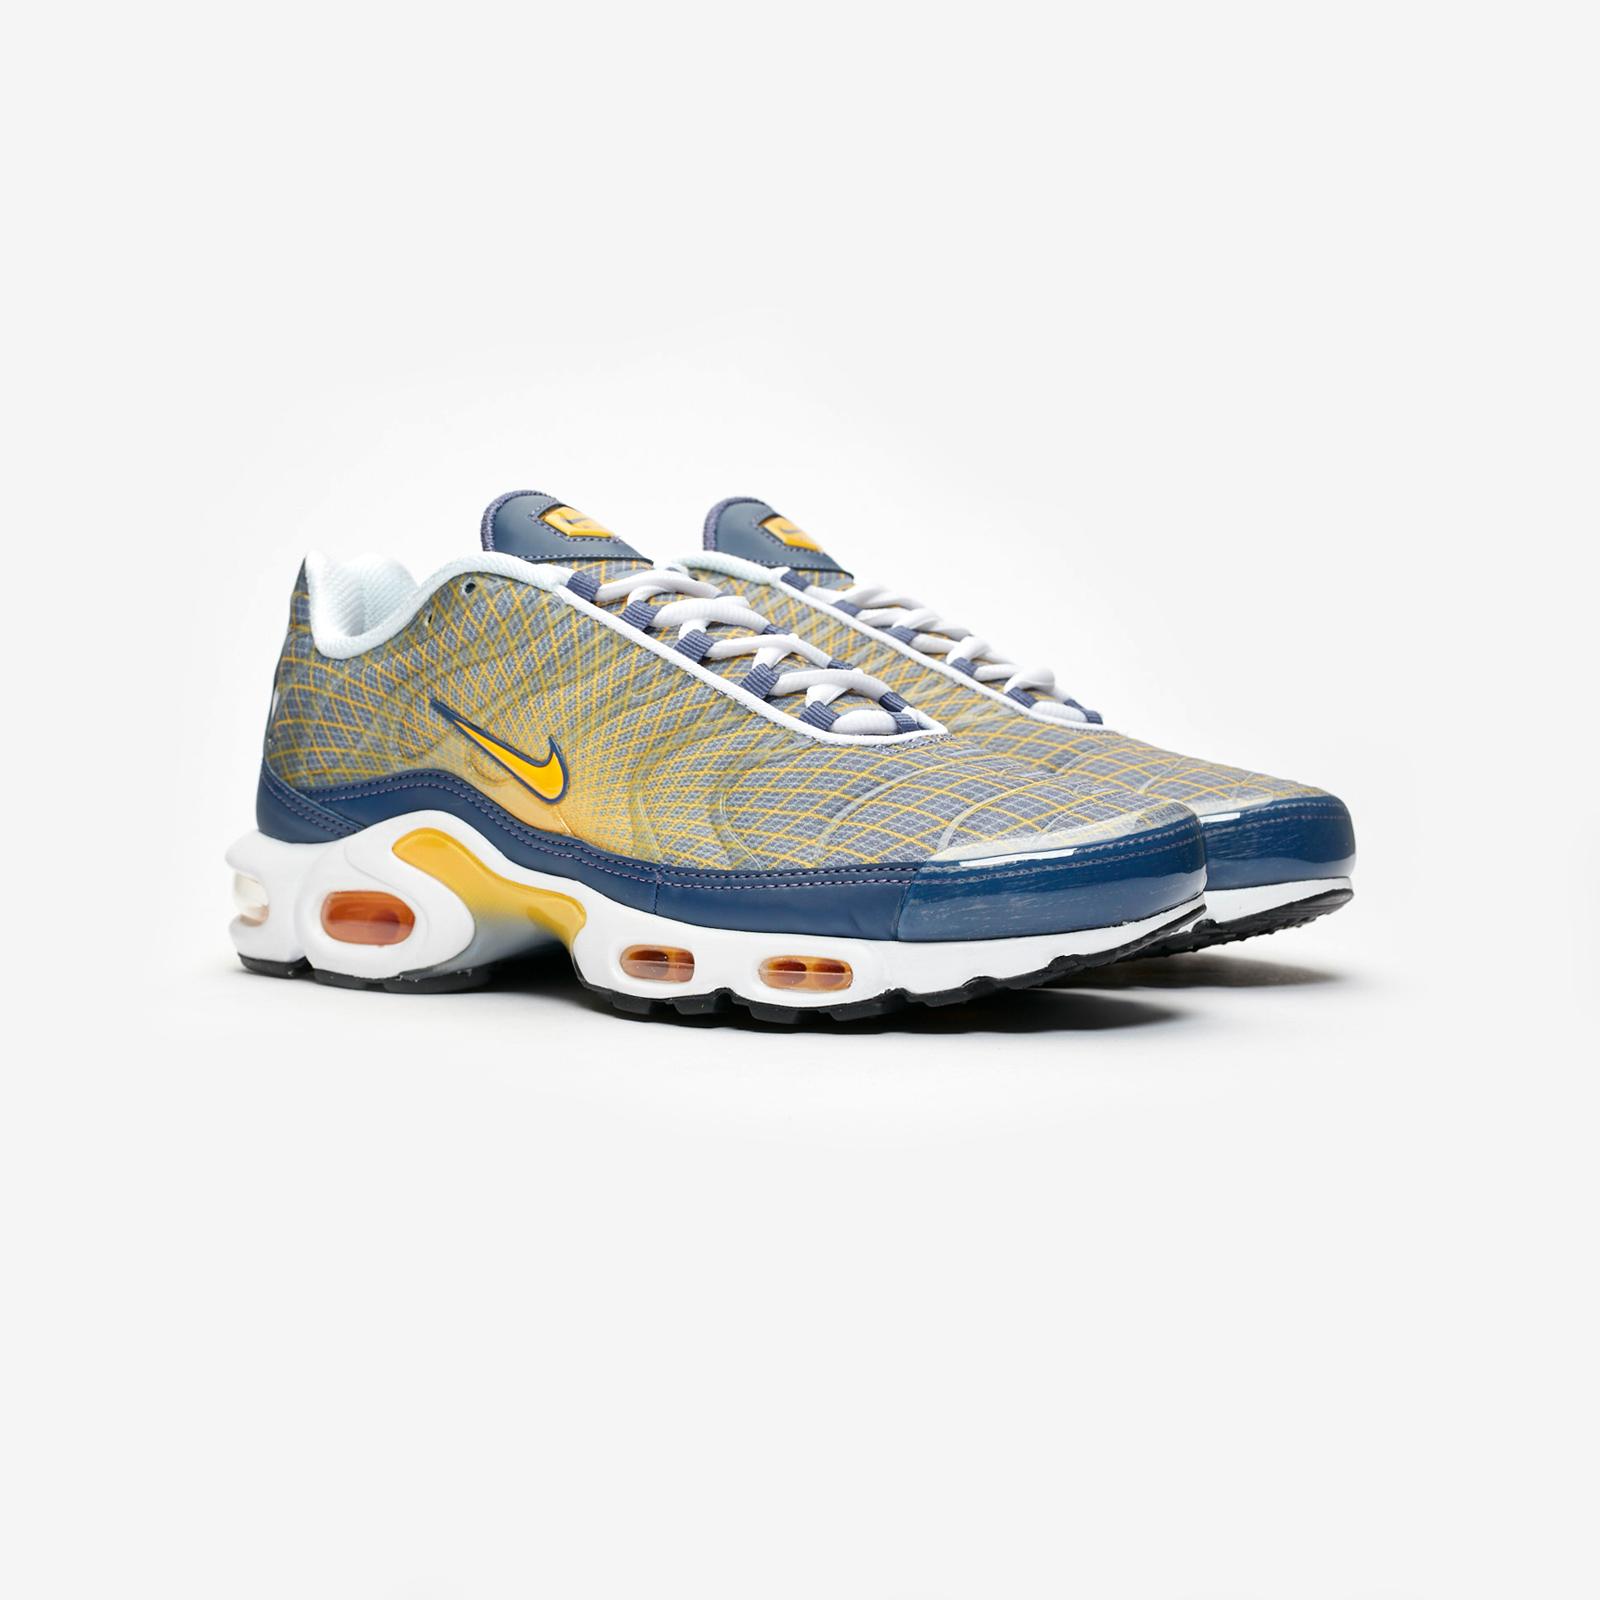 the latest c8849 3e837 Nike Sportswear Air Max Plus OG